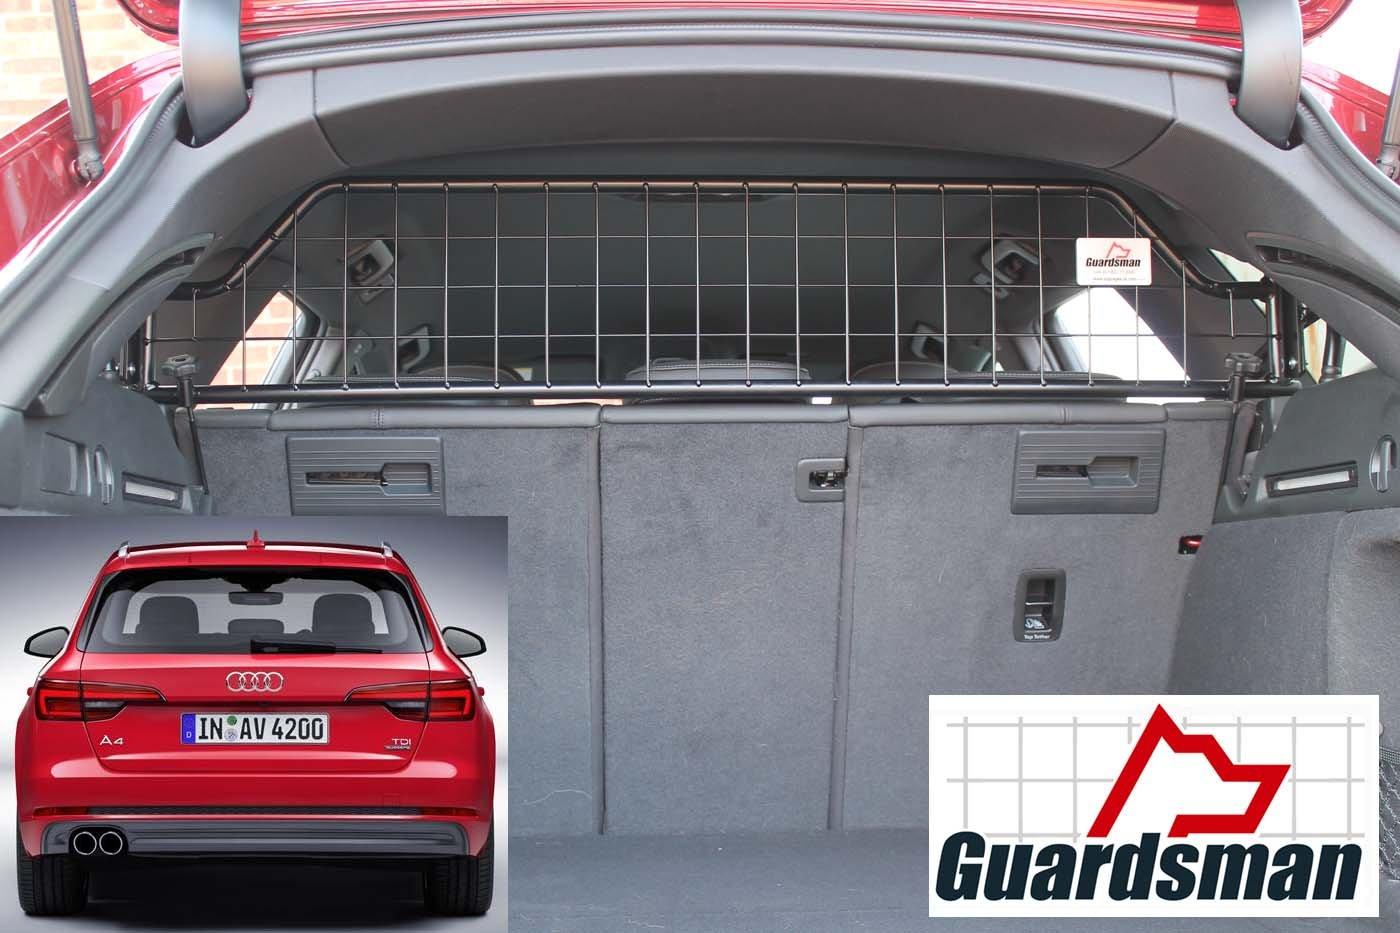 Range Rover Evoque 5 DR   Dog Guard  Part no.G1419